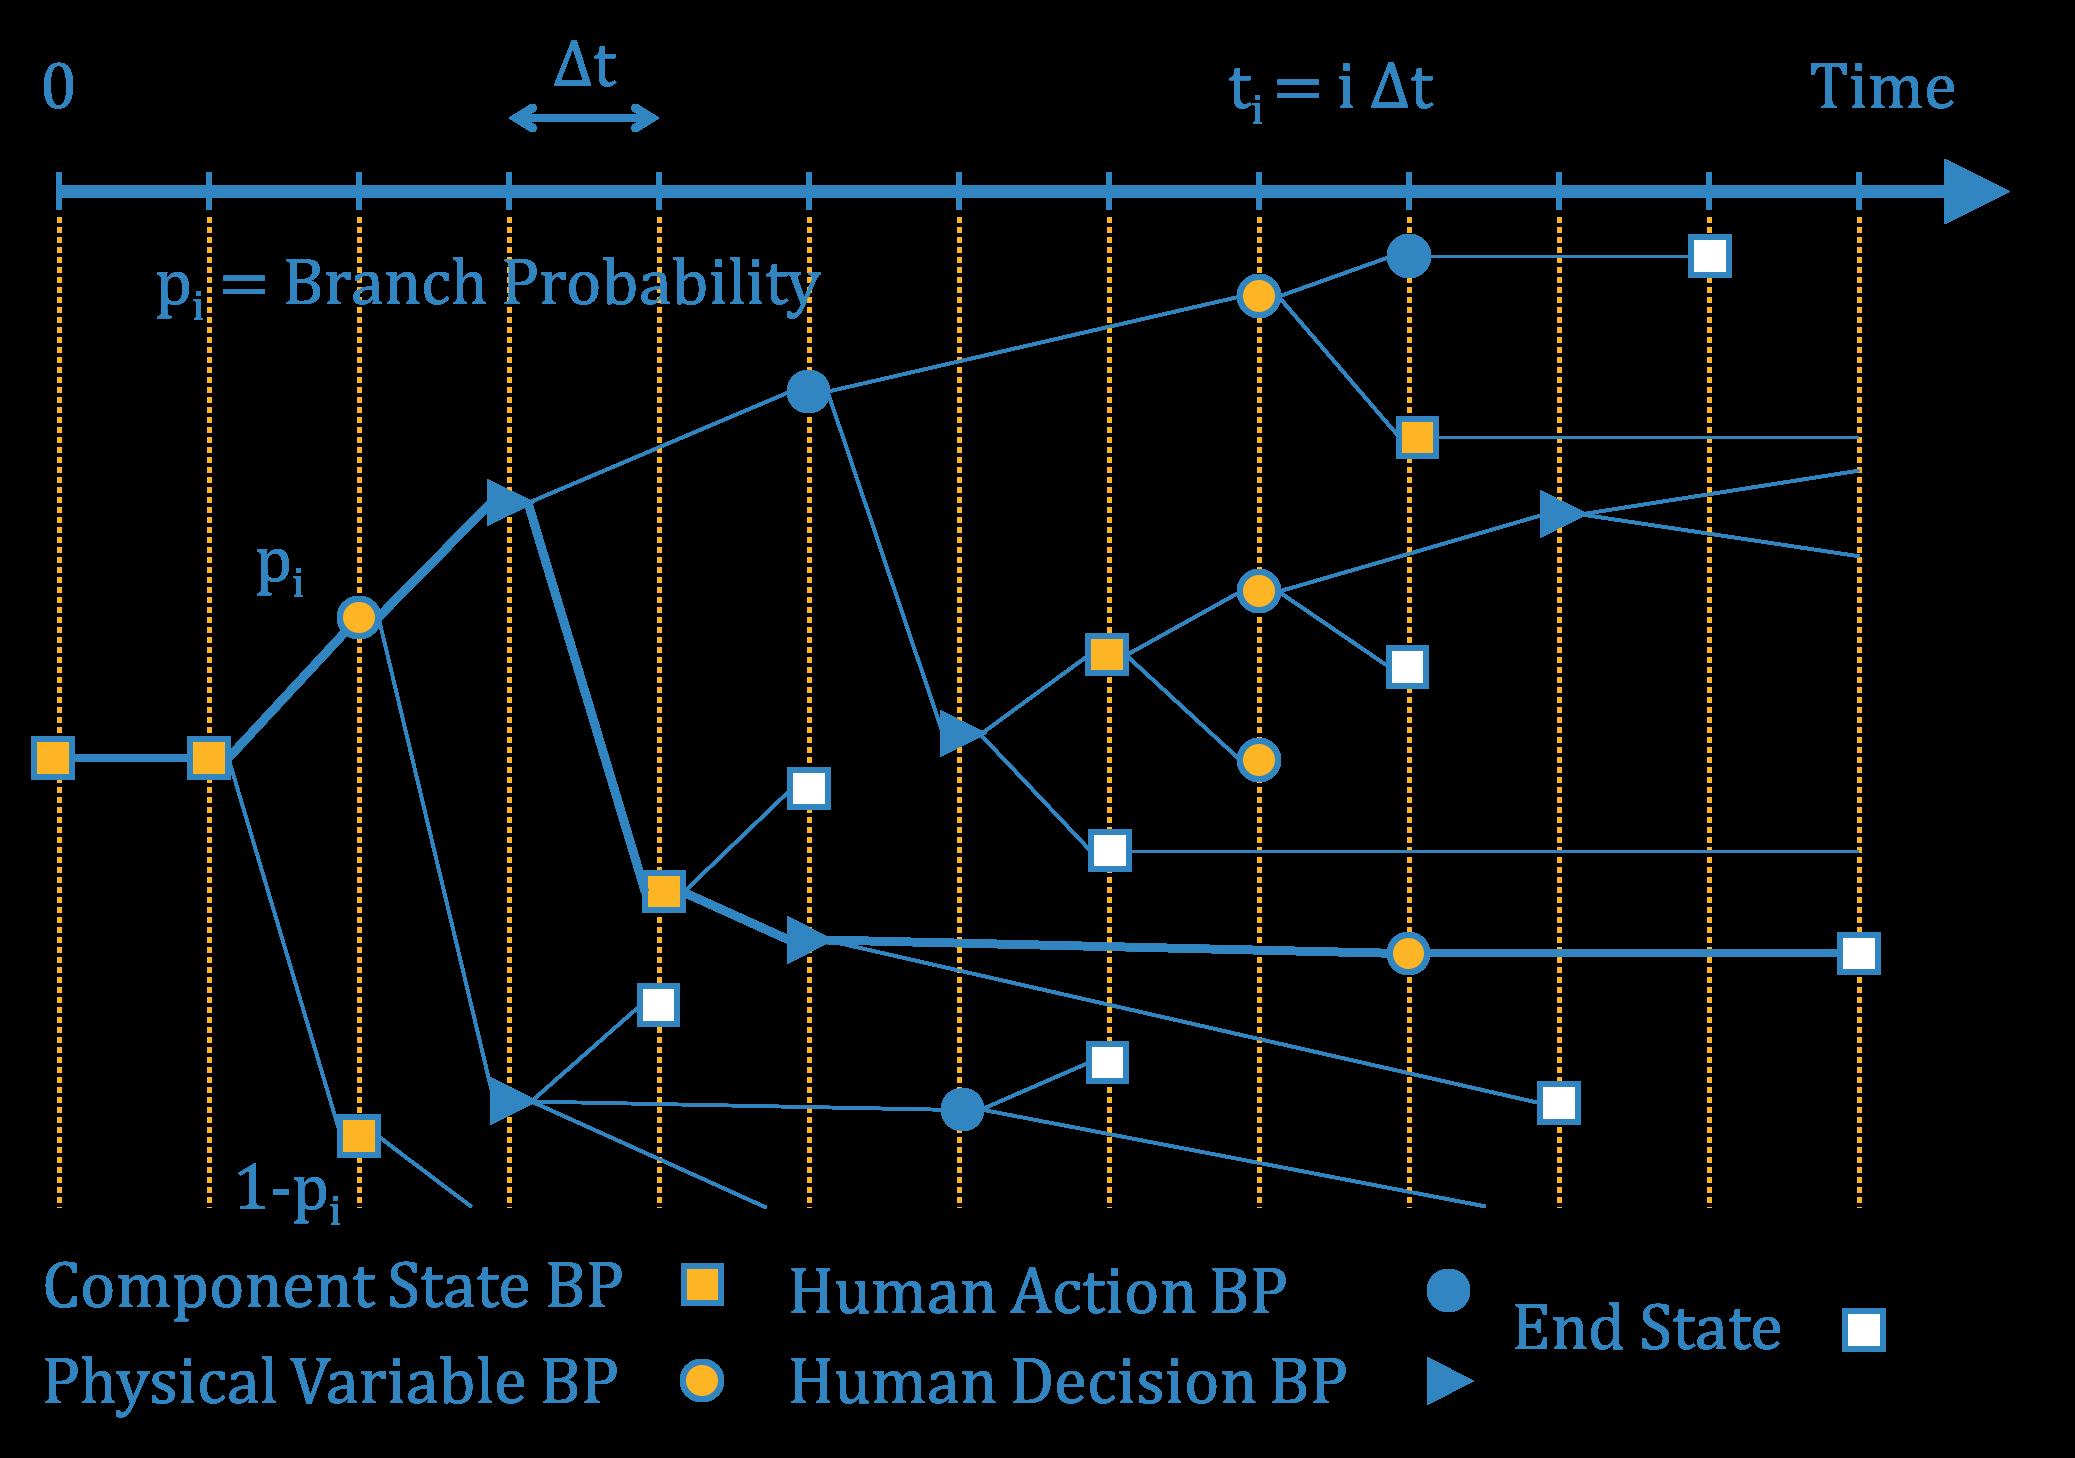 Discrete dynamic event tree (DDET)